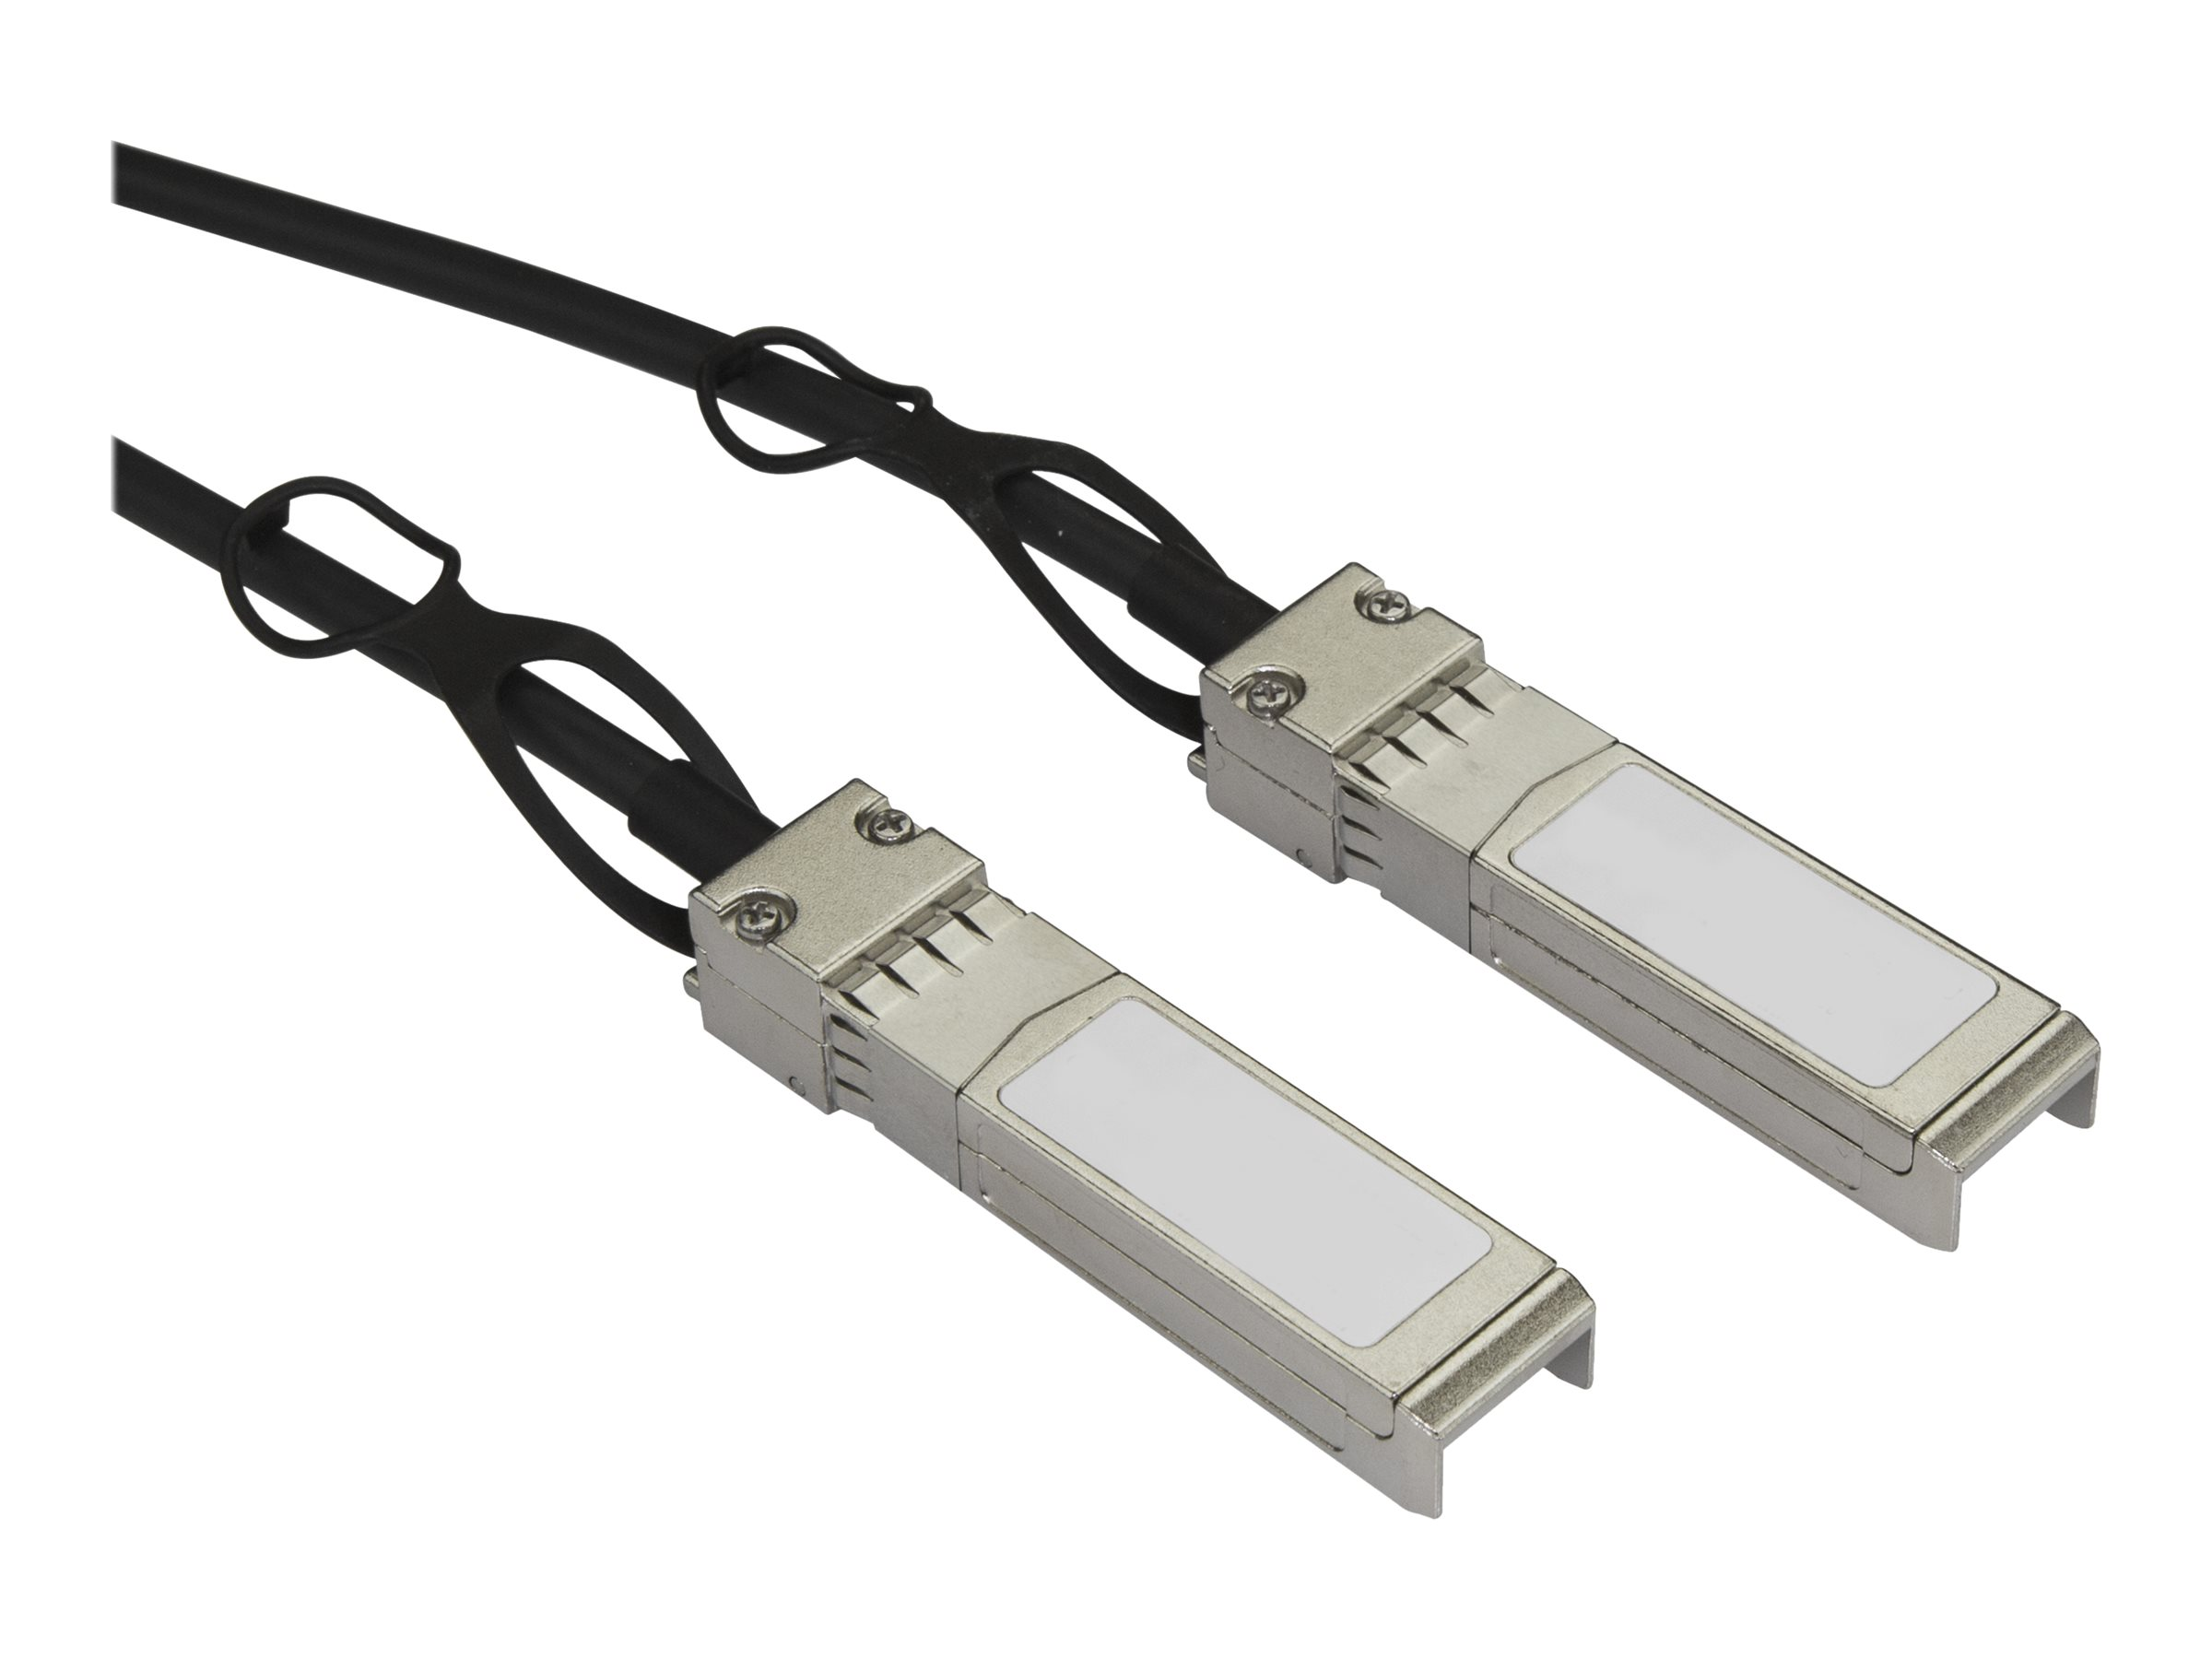 StarTech.com 6m Cisco SFP-H10GB-CU1-5M konform - SFP+ Direktverbindungskabel - 10Gb Twinax Kabel - Passives SFP+ Kabel - 10GBase